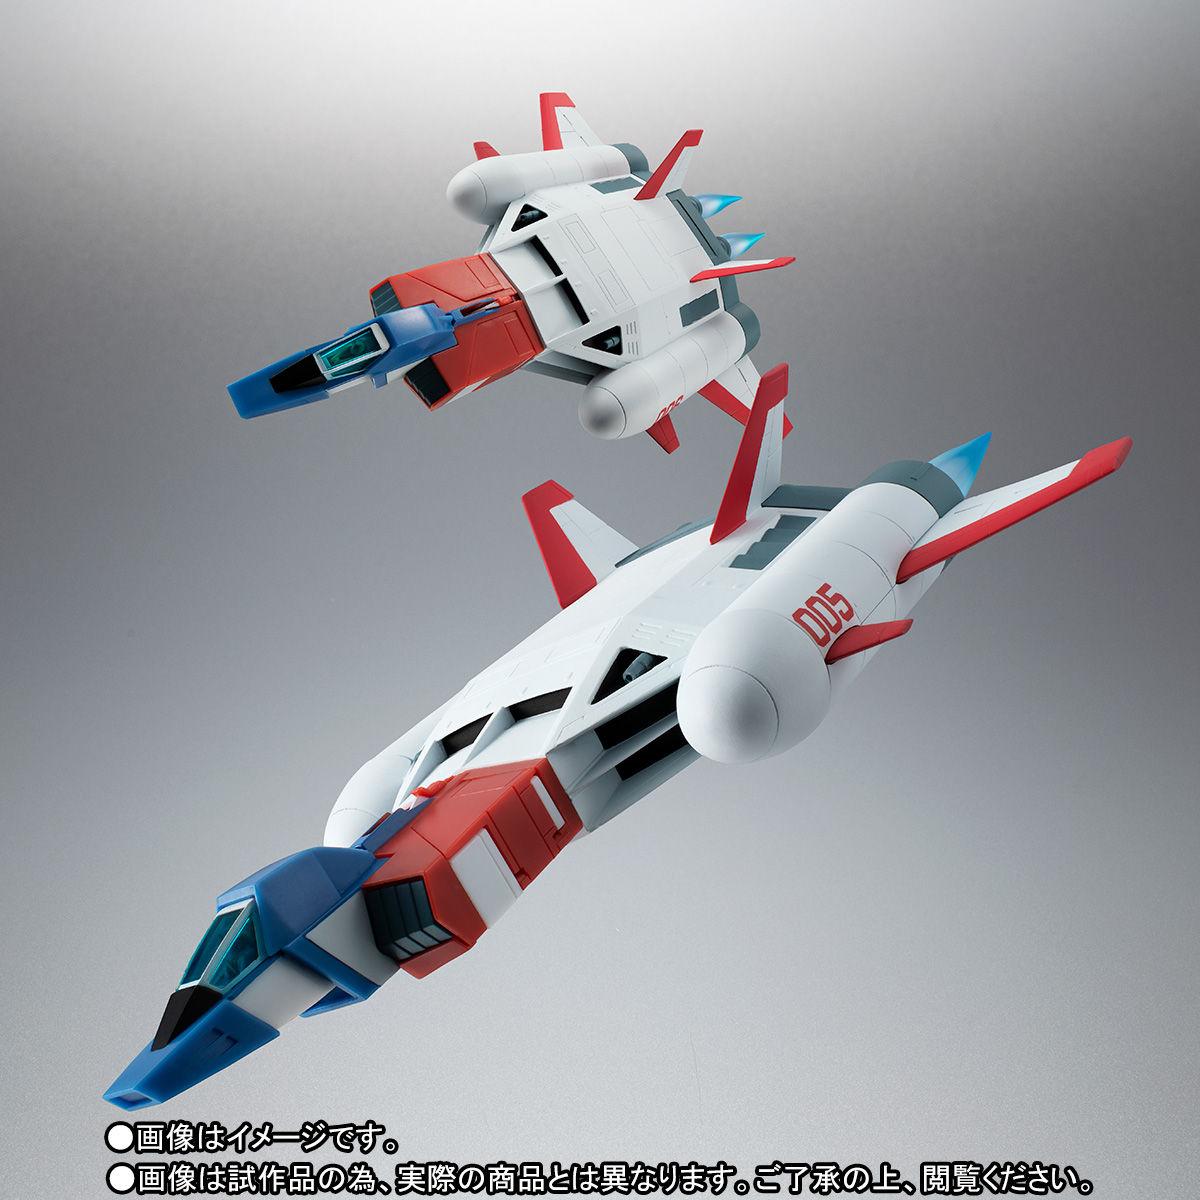 ROBOT魂〈SIDE MS〉『FF-X7-Bst コア・ブースター 2機セット ver. A.N.I.M.E. ~スレッガー005 & セイラ006~』機動戦士ガンダム 可動フィギュア-001